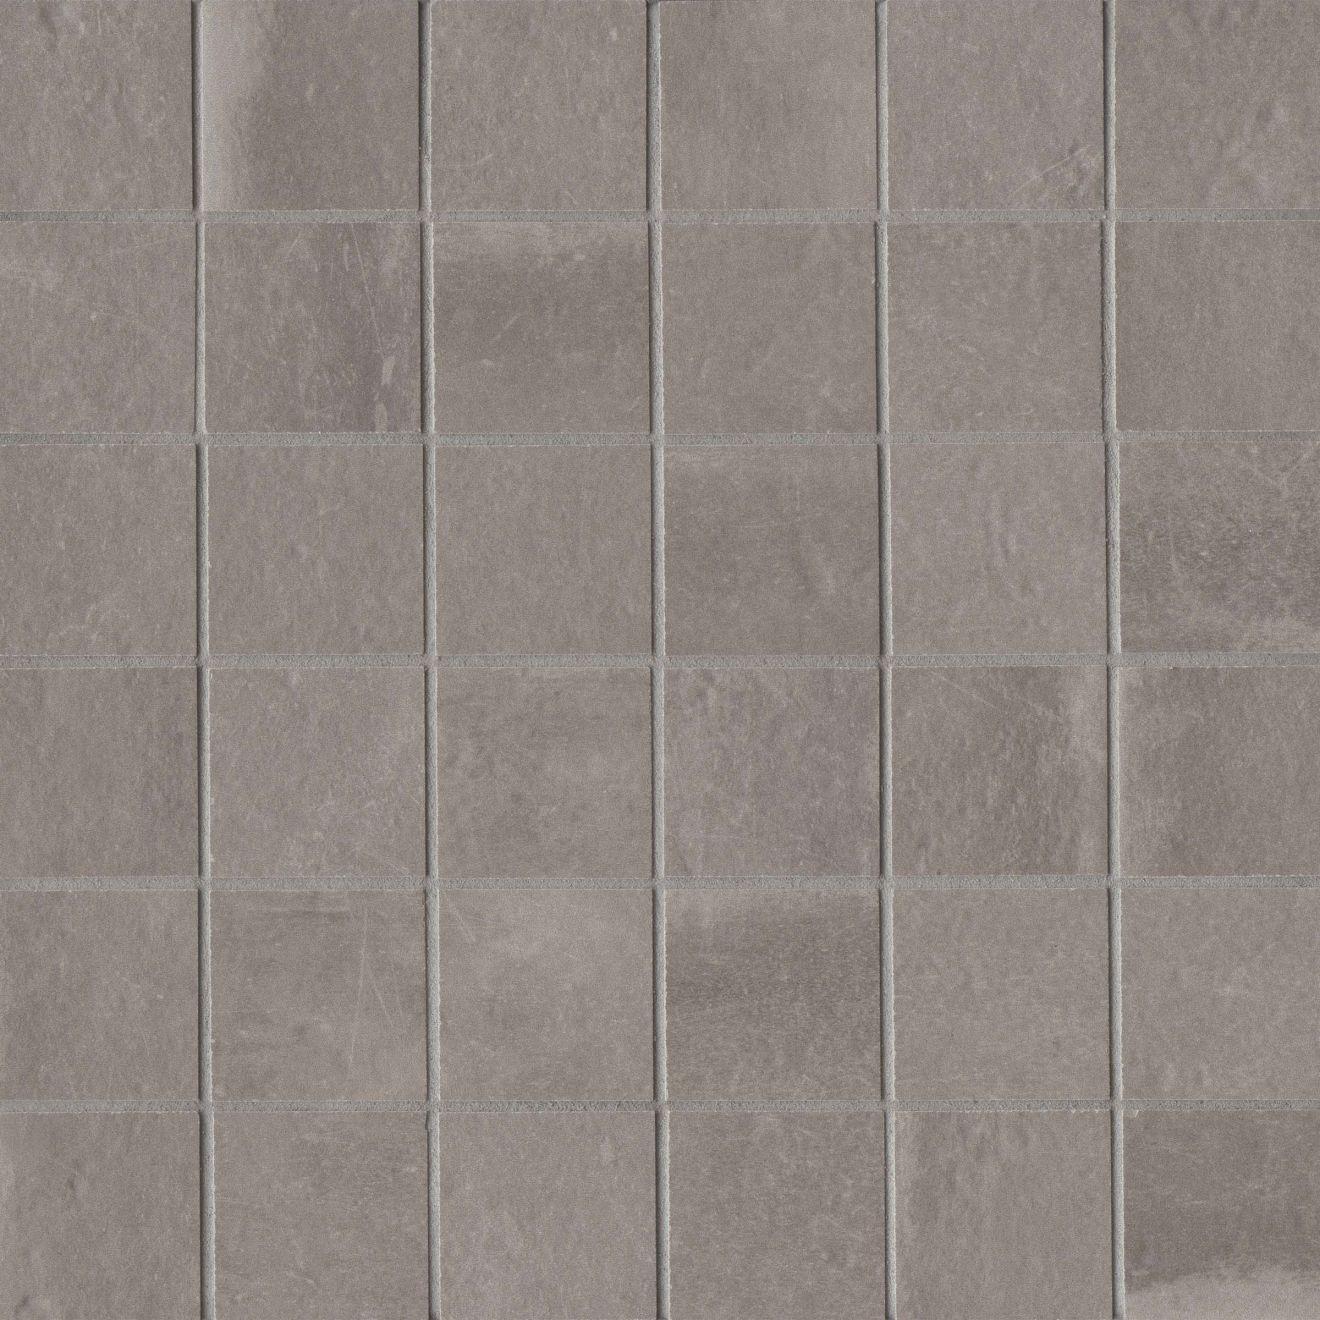 "Palazzo 2"" x 2"" Floor & Wall Mosaic in Vintage Grey"